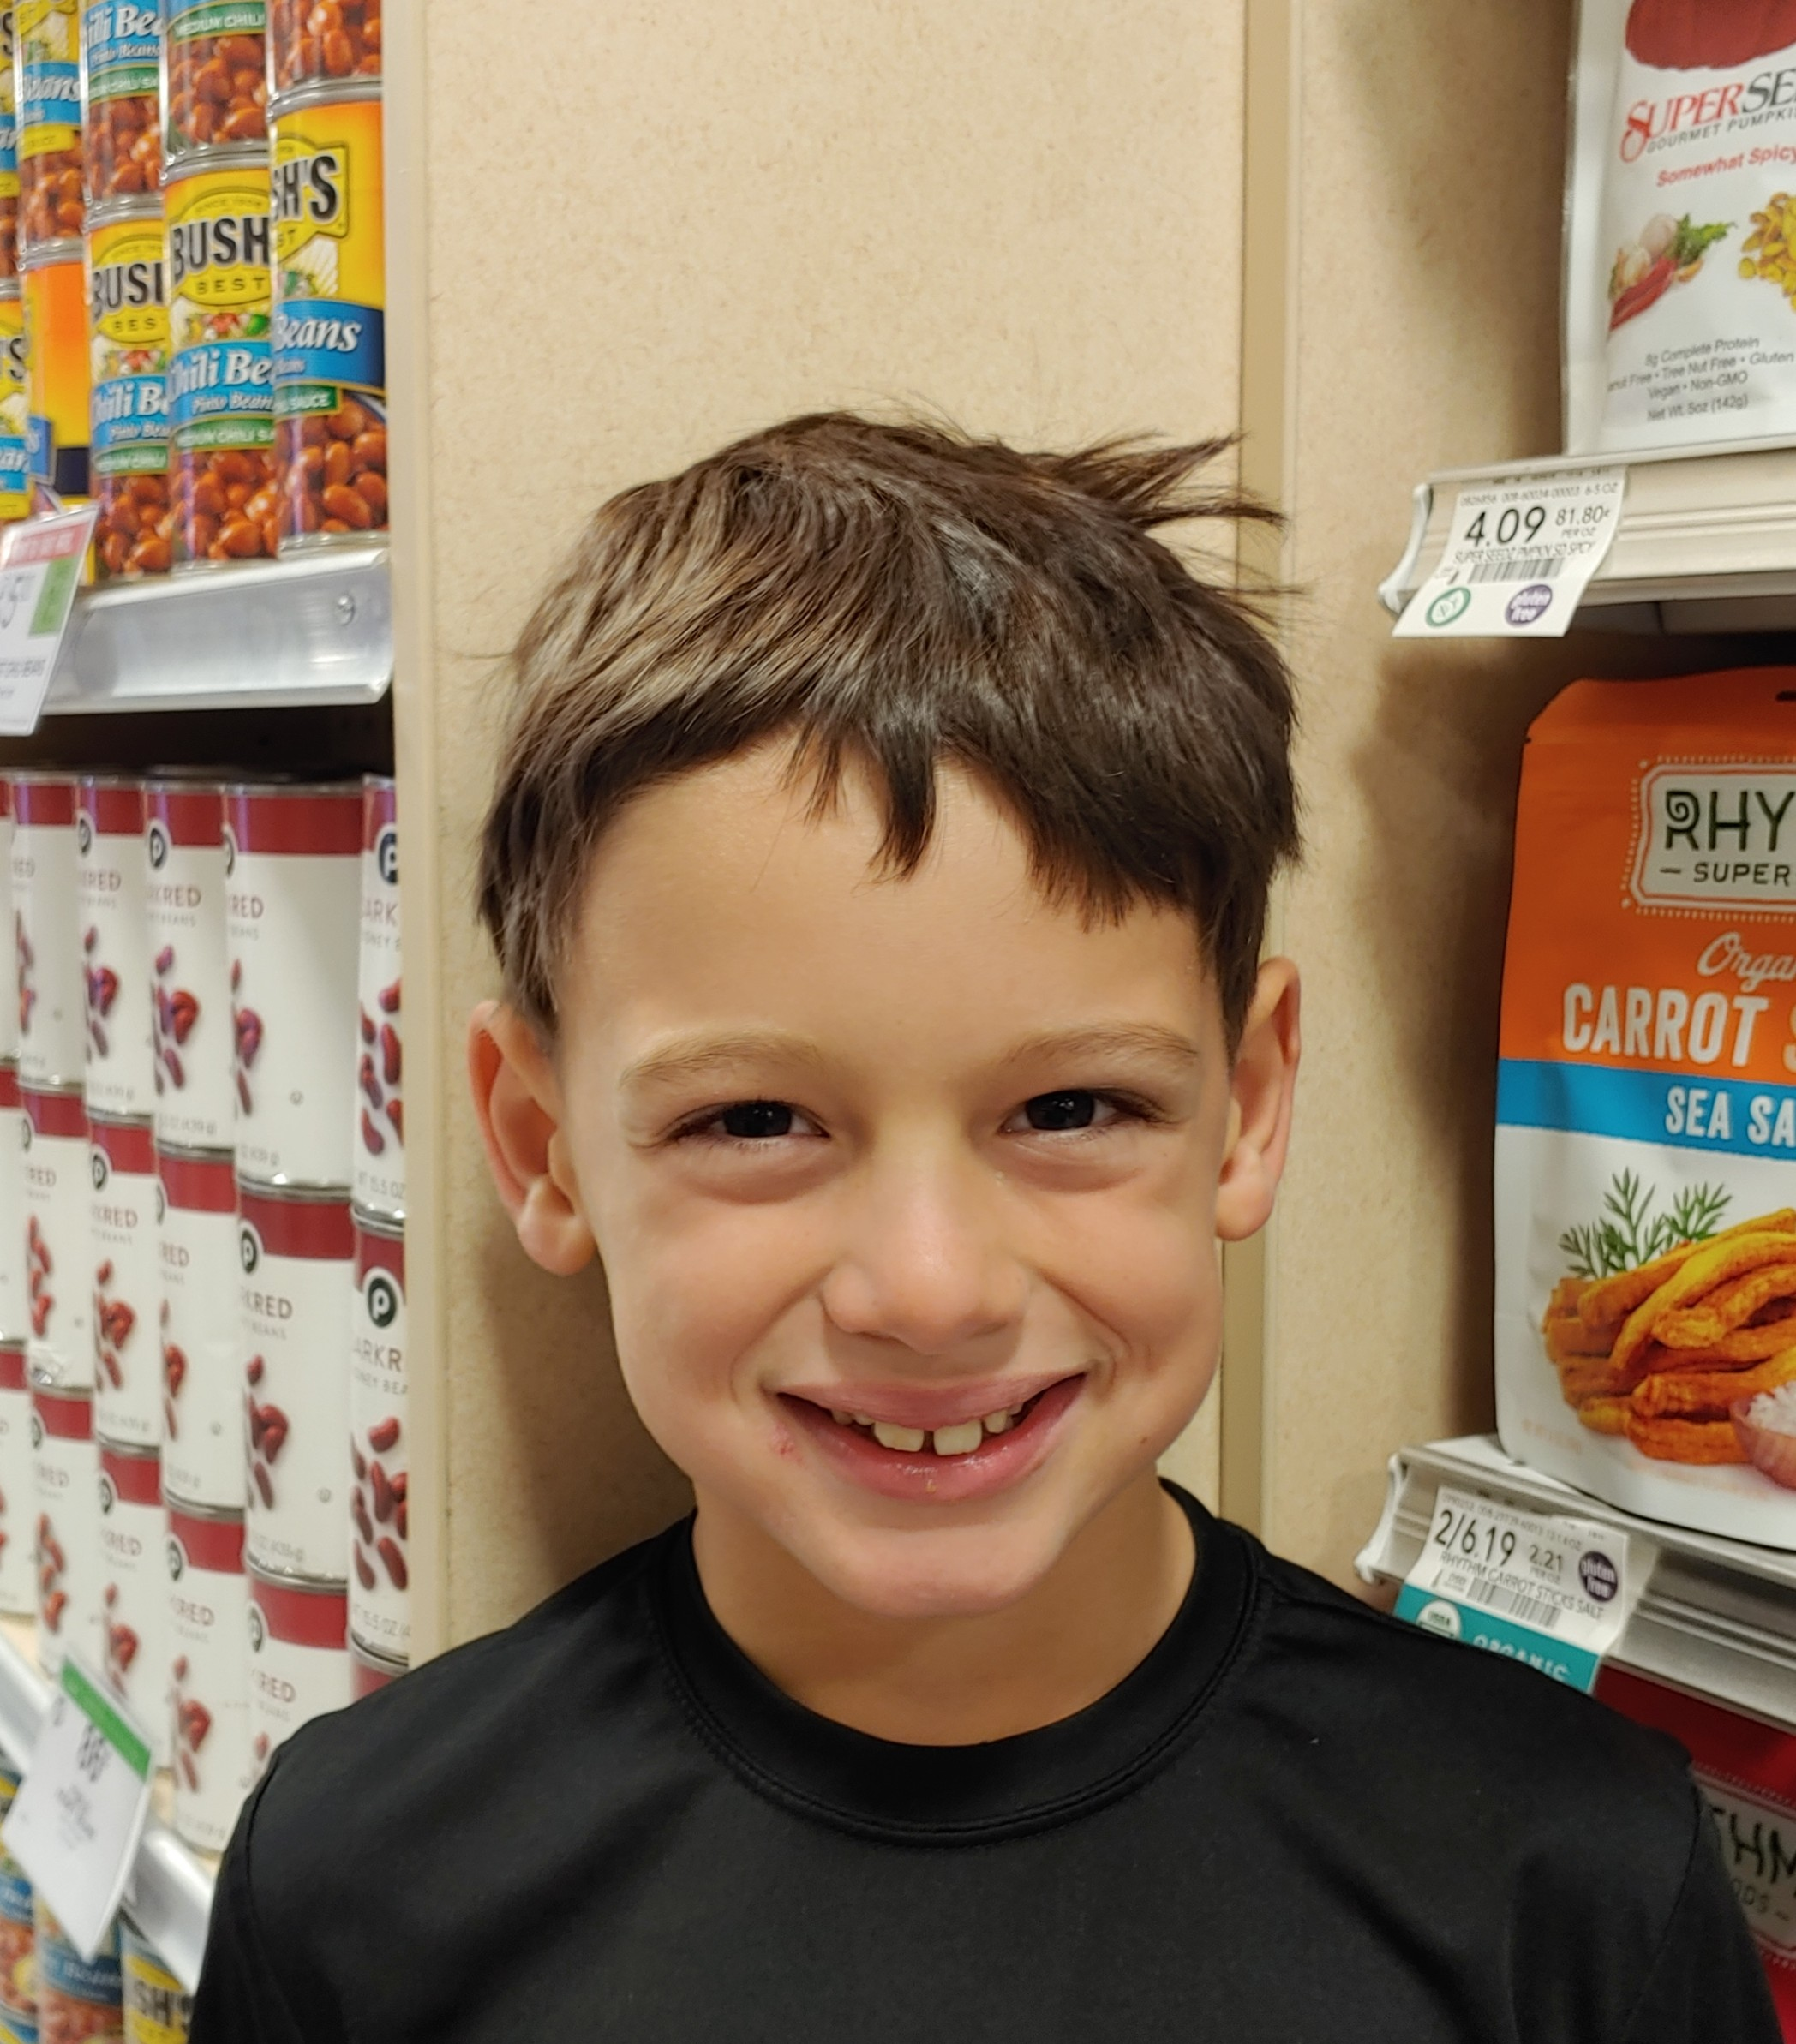 My favorite cake is vanilla ice cream cake.  Cooper, age 7  Daniel Island